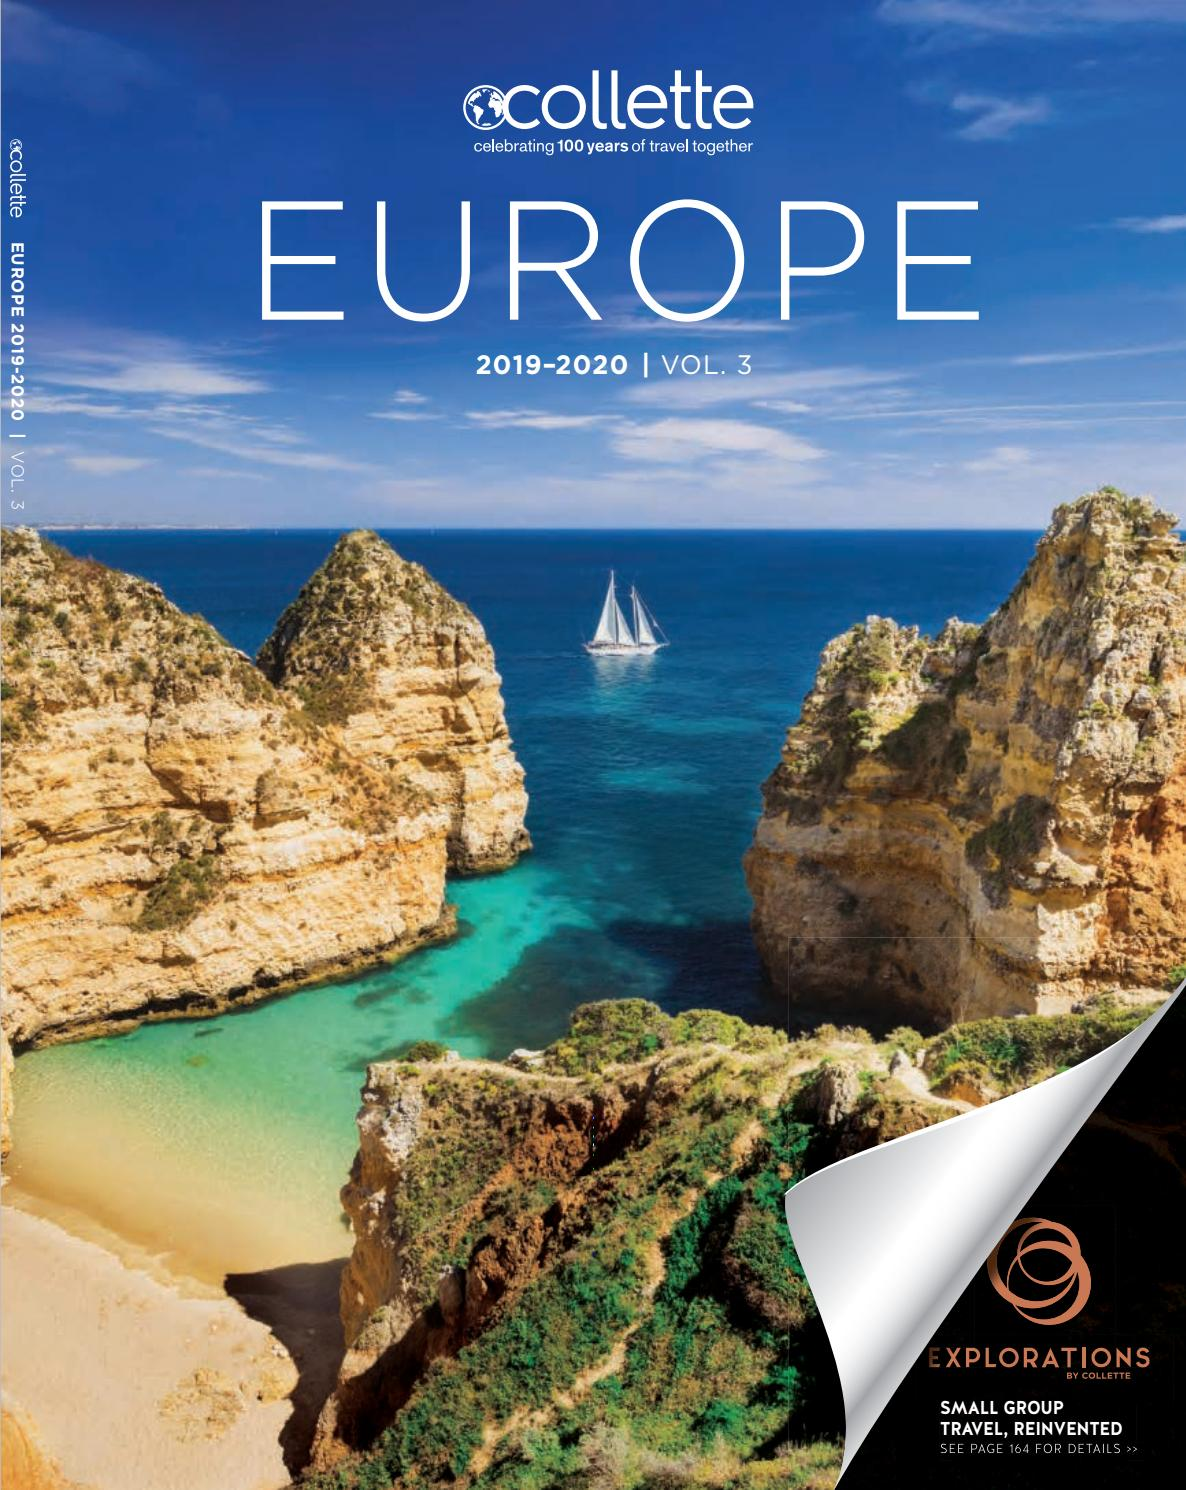 Dynamics Isola Della Scala 2019 2020 vol 3 europe us by collette - issuu